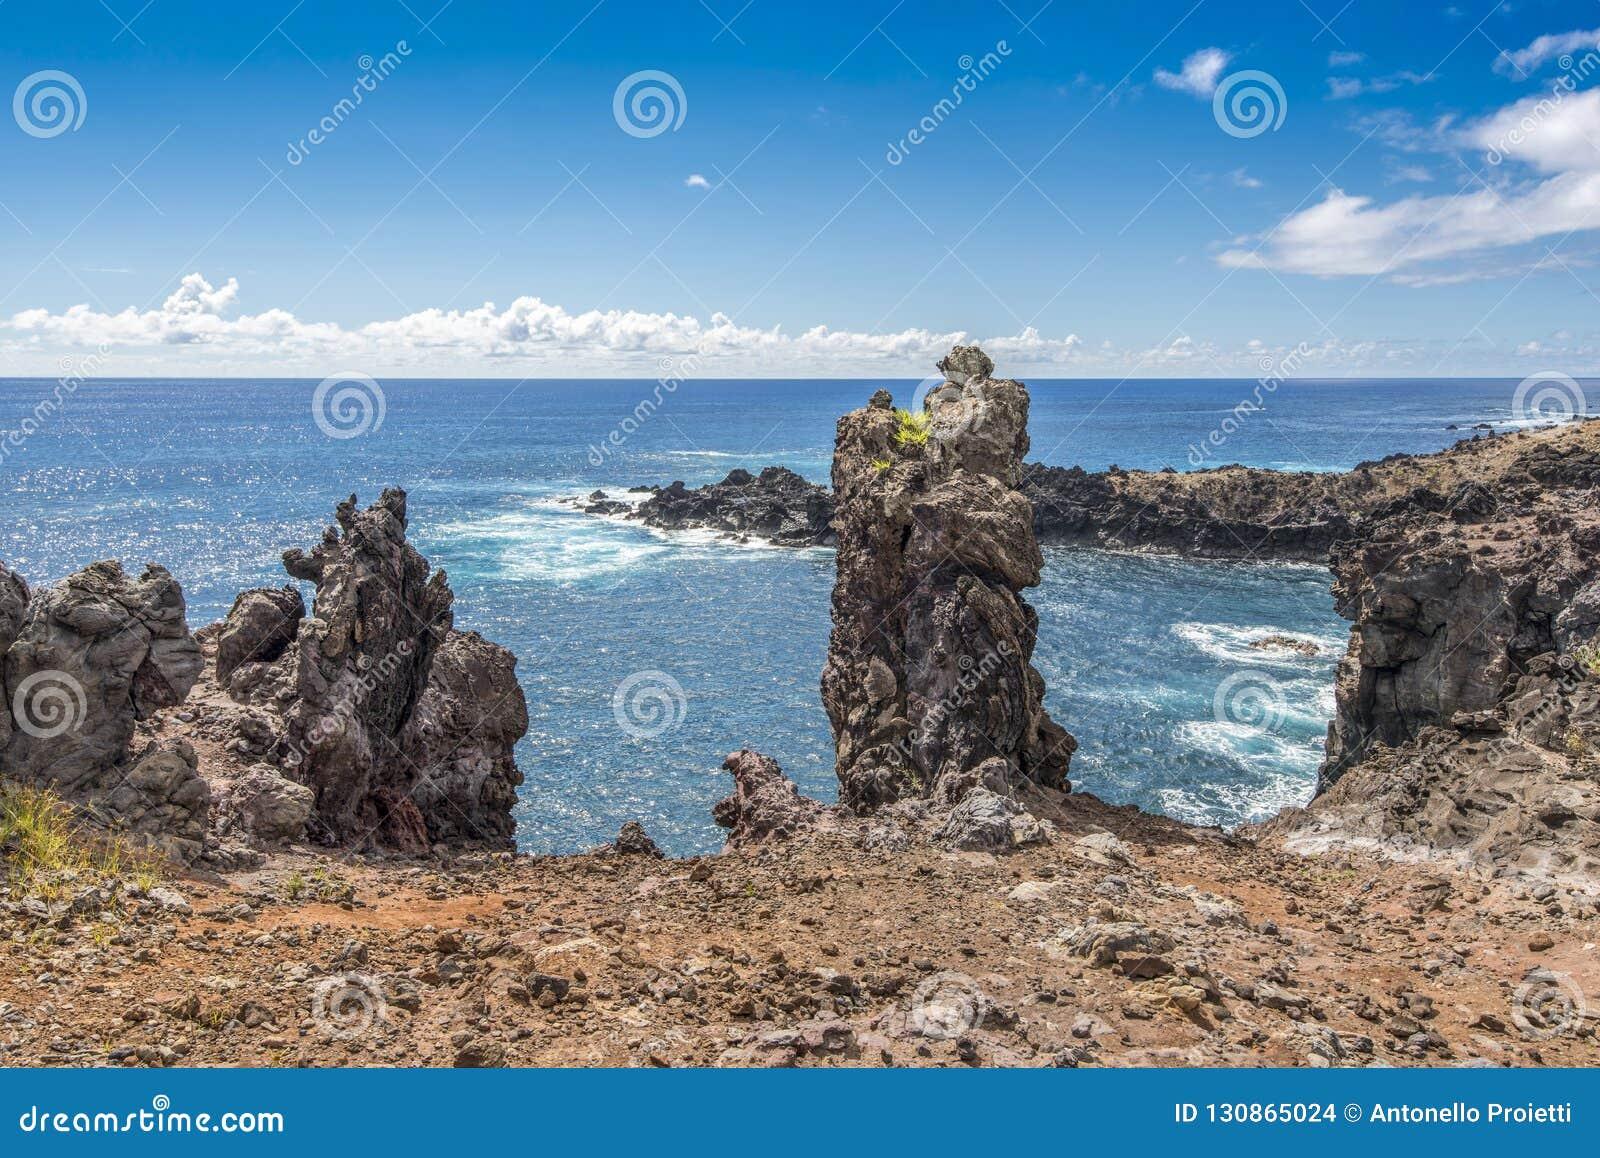 Взгляд высокого угла залива пещеры Ана Kai Tangata